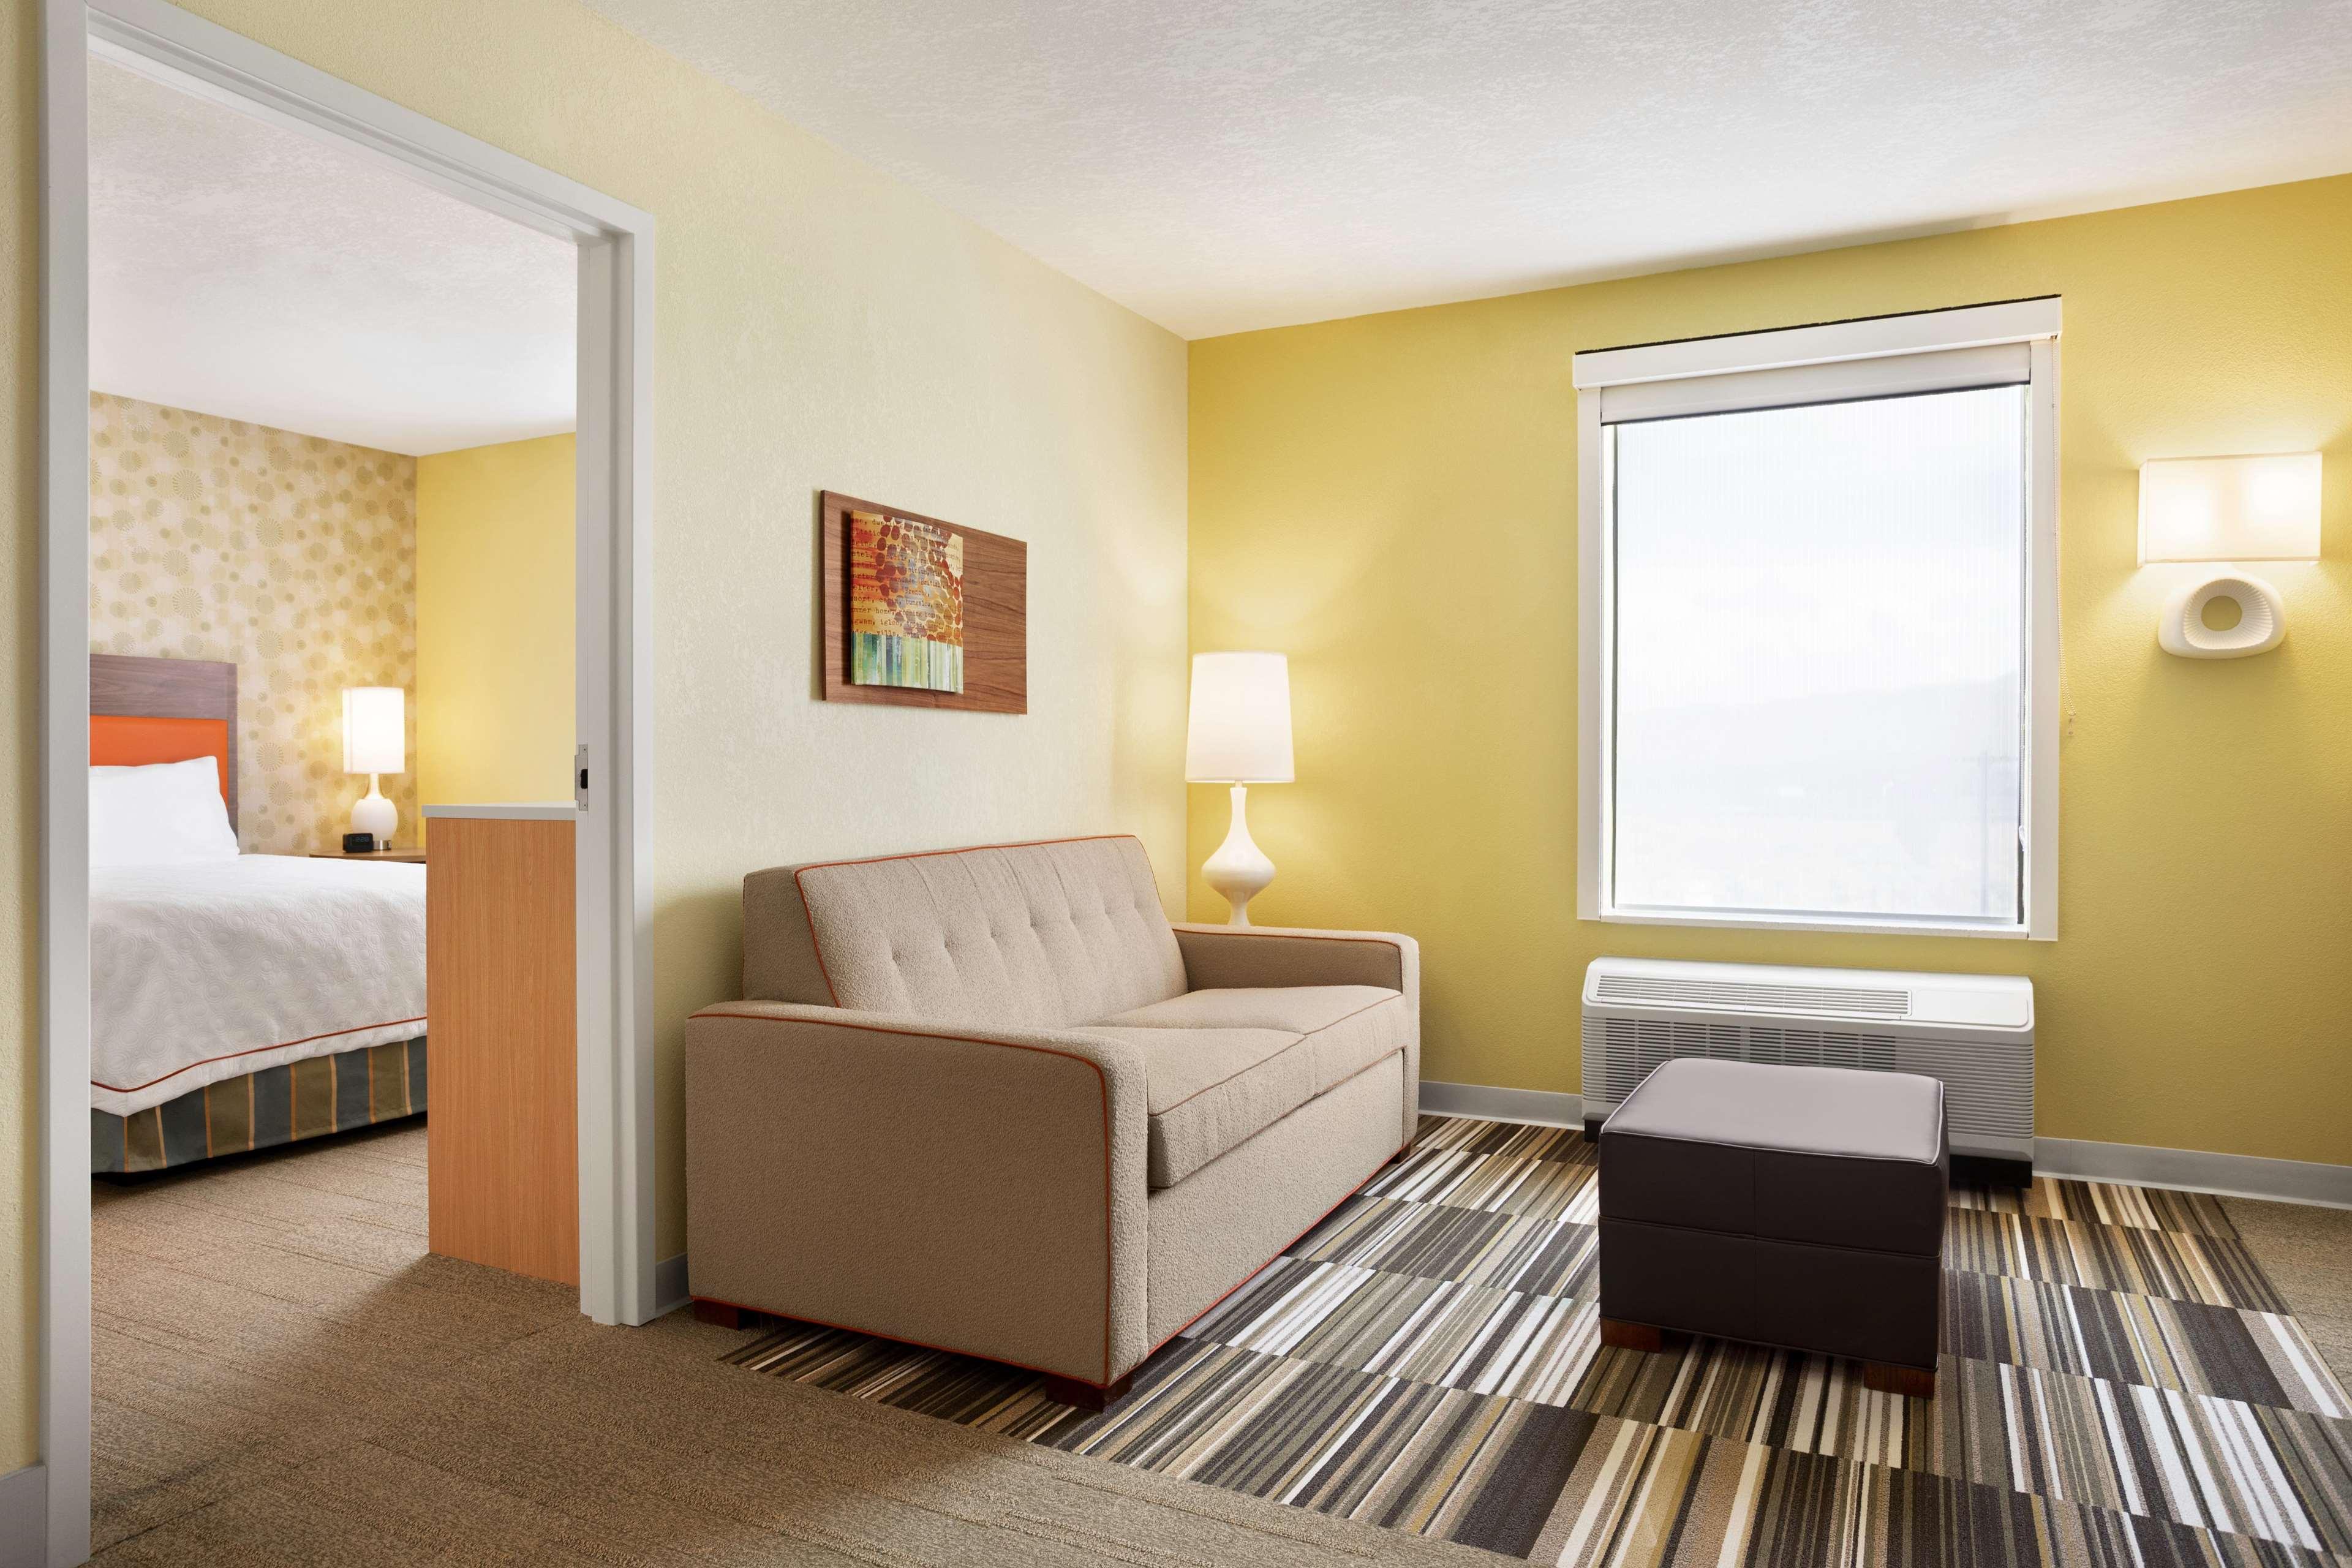 Home2 Suites by Hilton Elko image 24